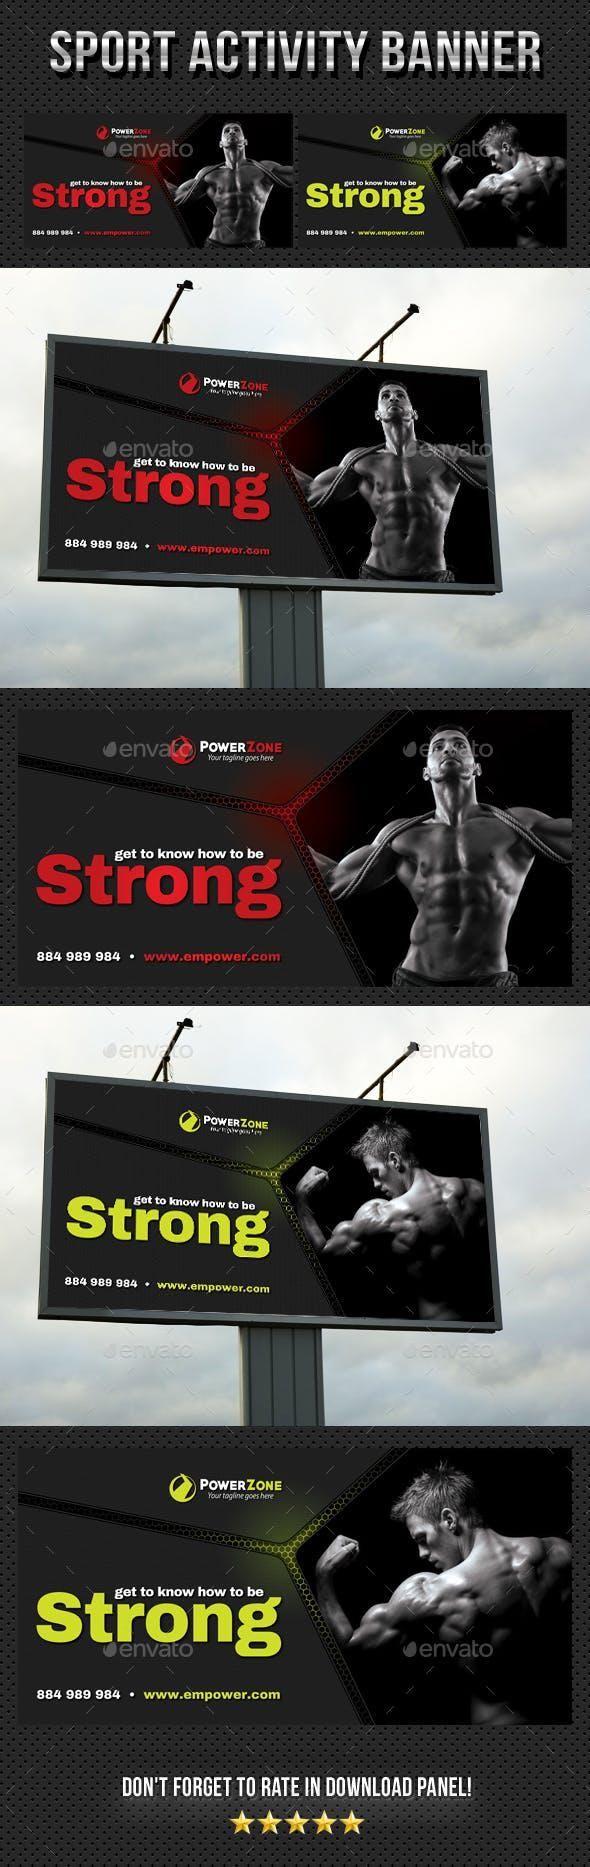 Sport Activity Outdoor Banner 03 #graphicdesign #SignageDesign #graphicresources...